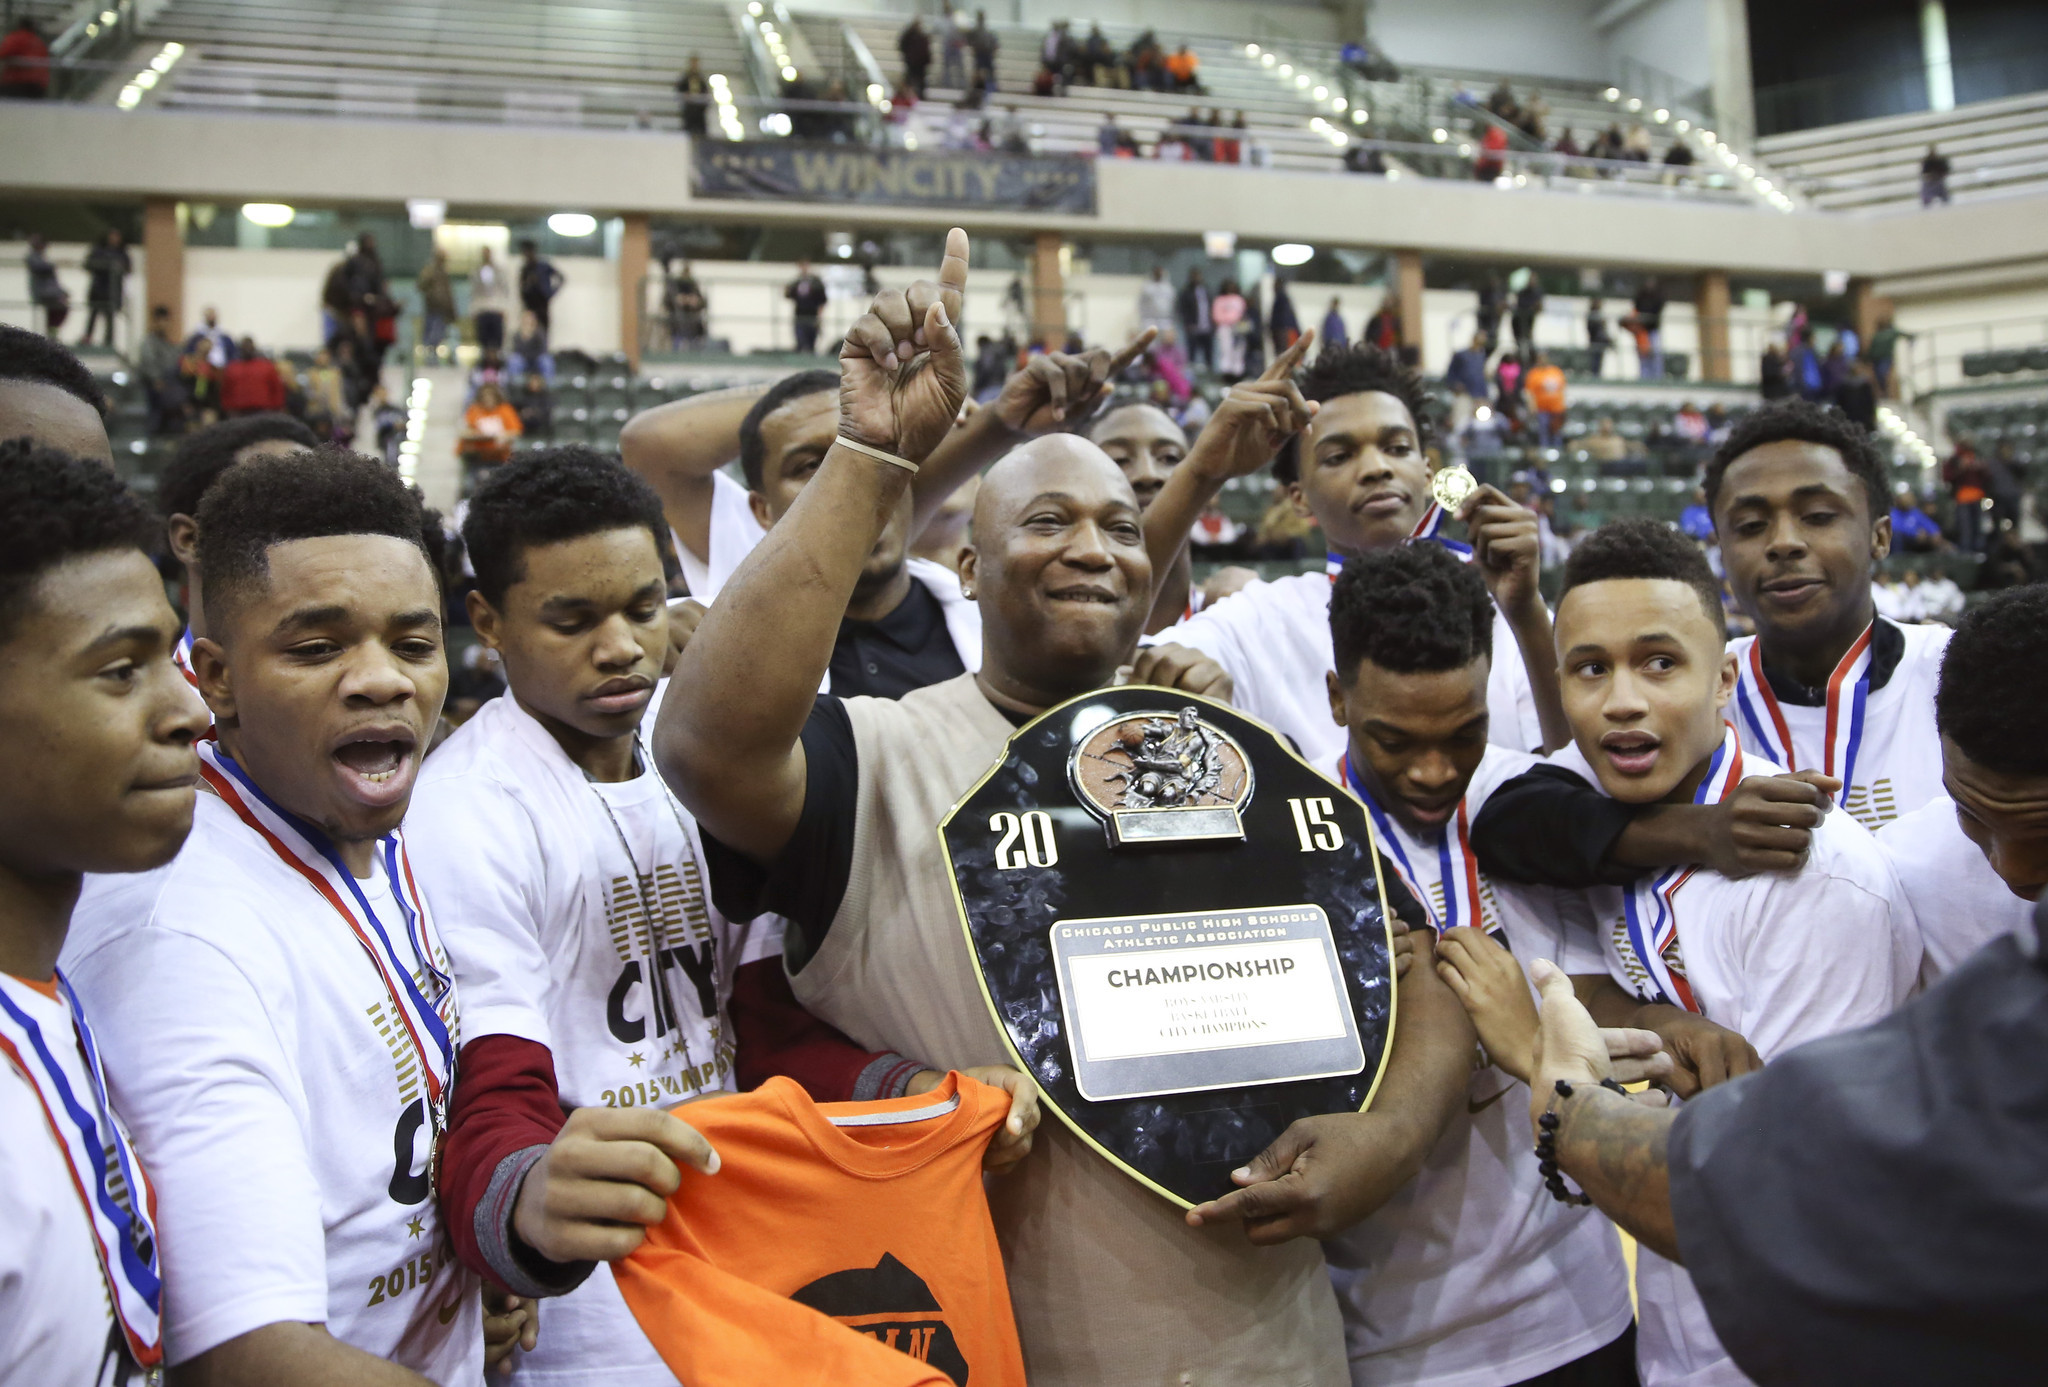 Boys Basketball: Bogan Holds Off Simeon To Win Public